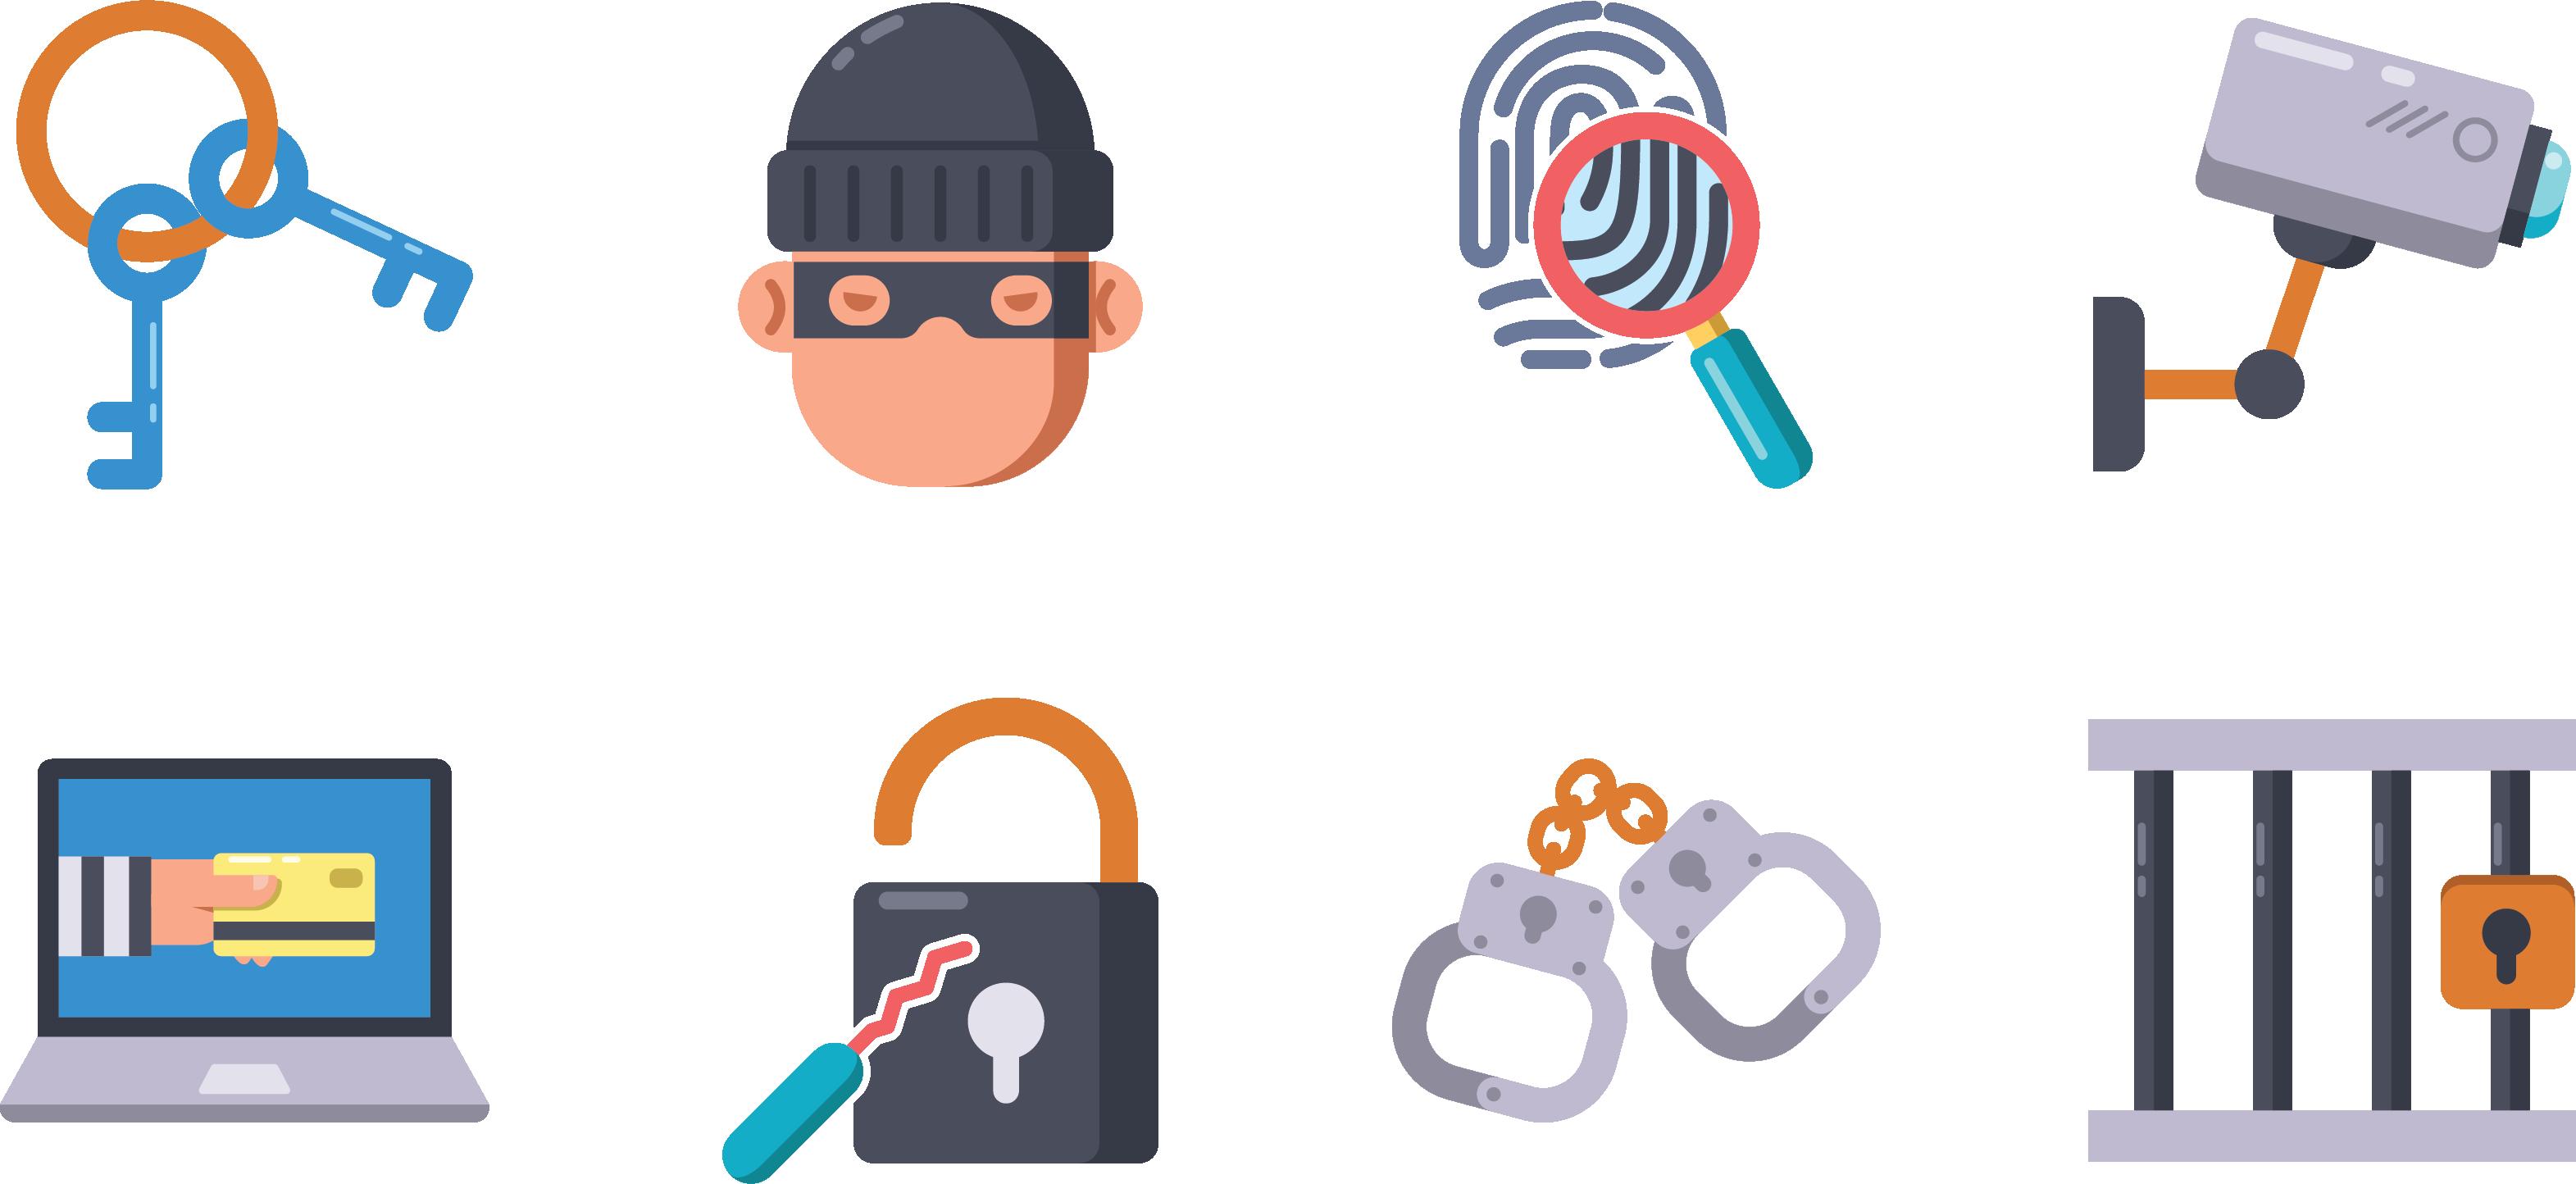 Crime robbery icon criminals. Handcuffs clipart criminal court